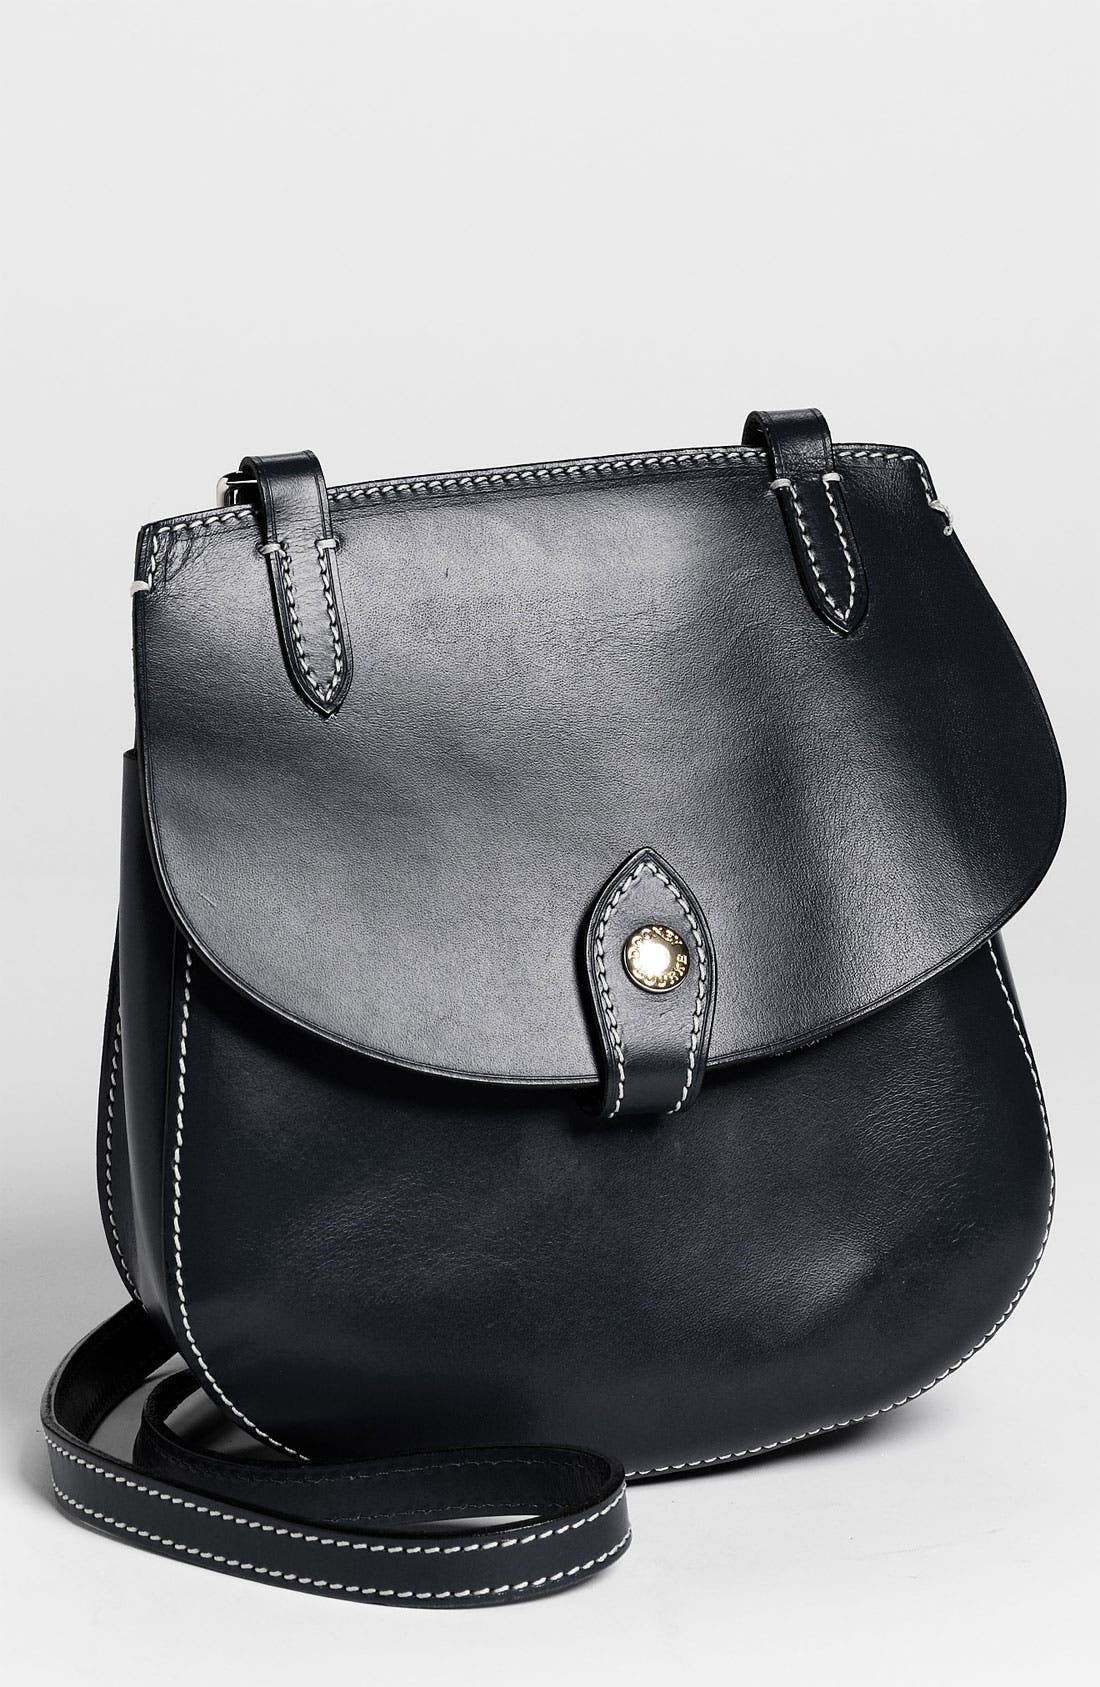 Main Image - Dooney & Bourke Leather Crossbody Bag